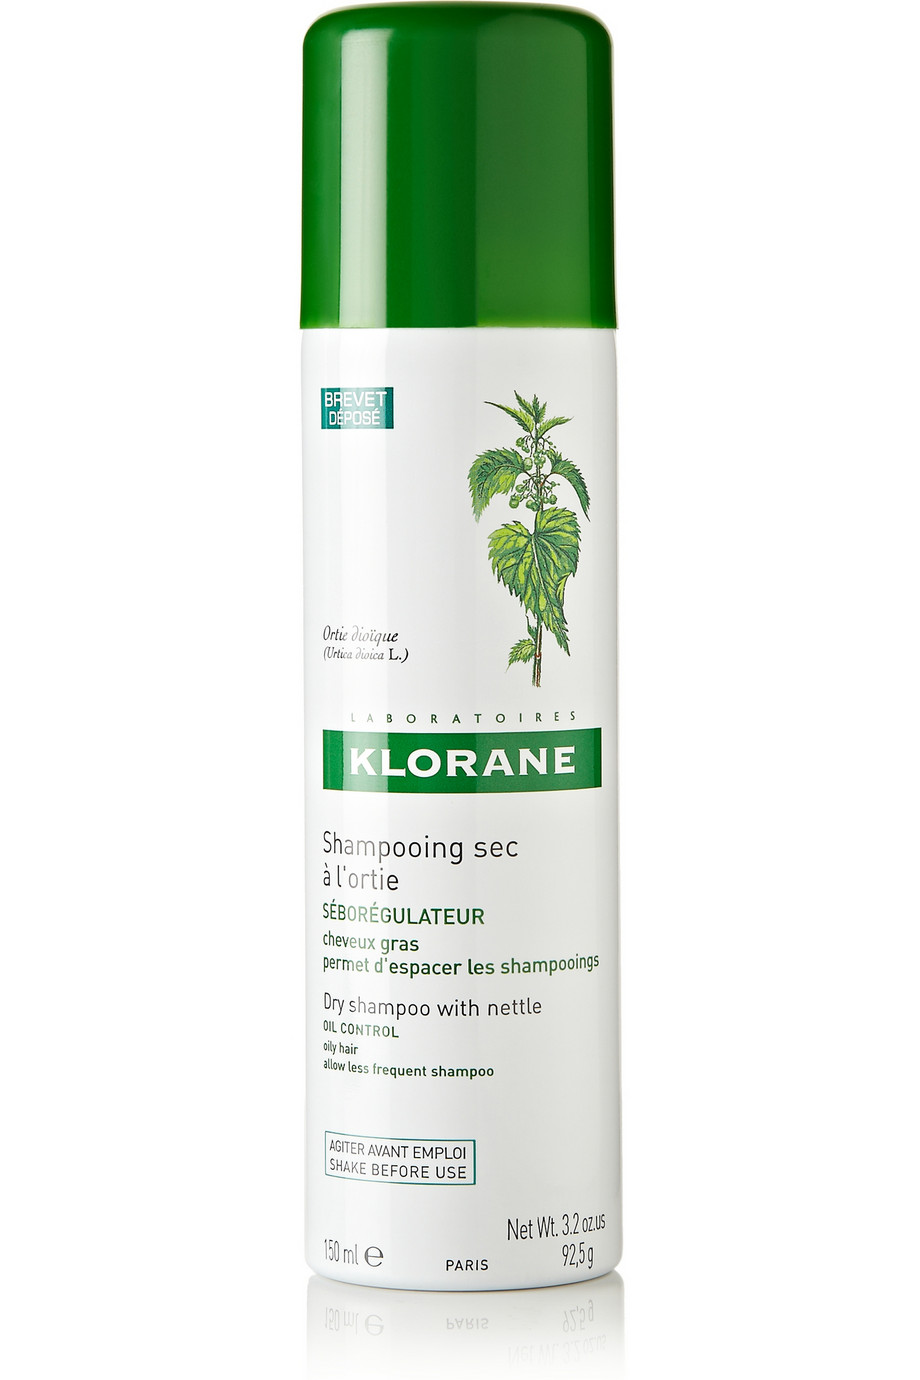 Klorane Dry Shampoo My Dry Shampoo Review A No Ones Diary